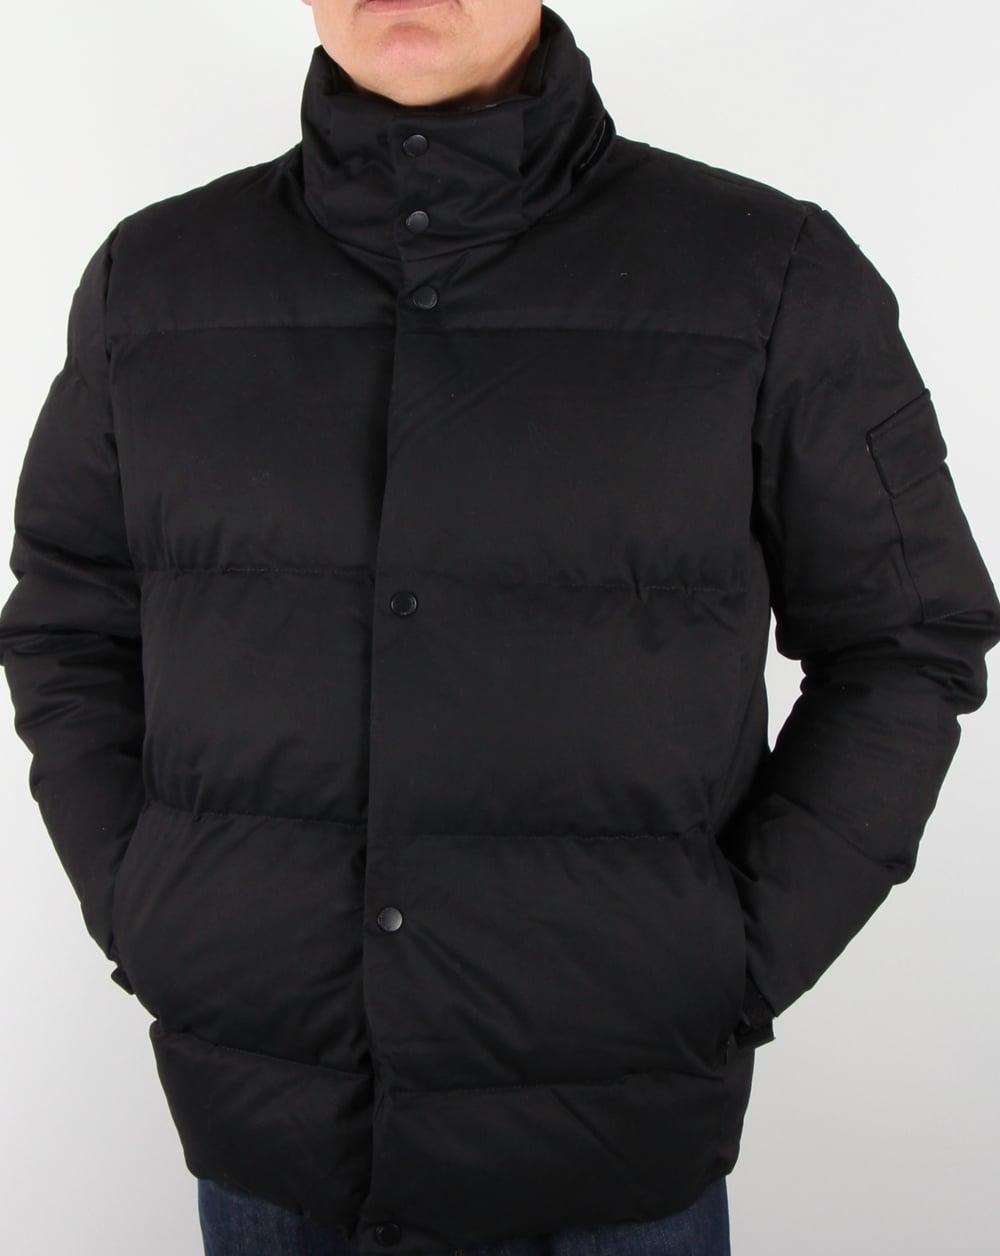 Bellfield Orsted Quilted Jacket Black Padded Coat Parka Mens